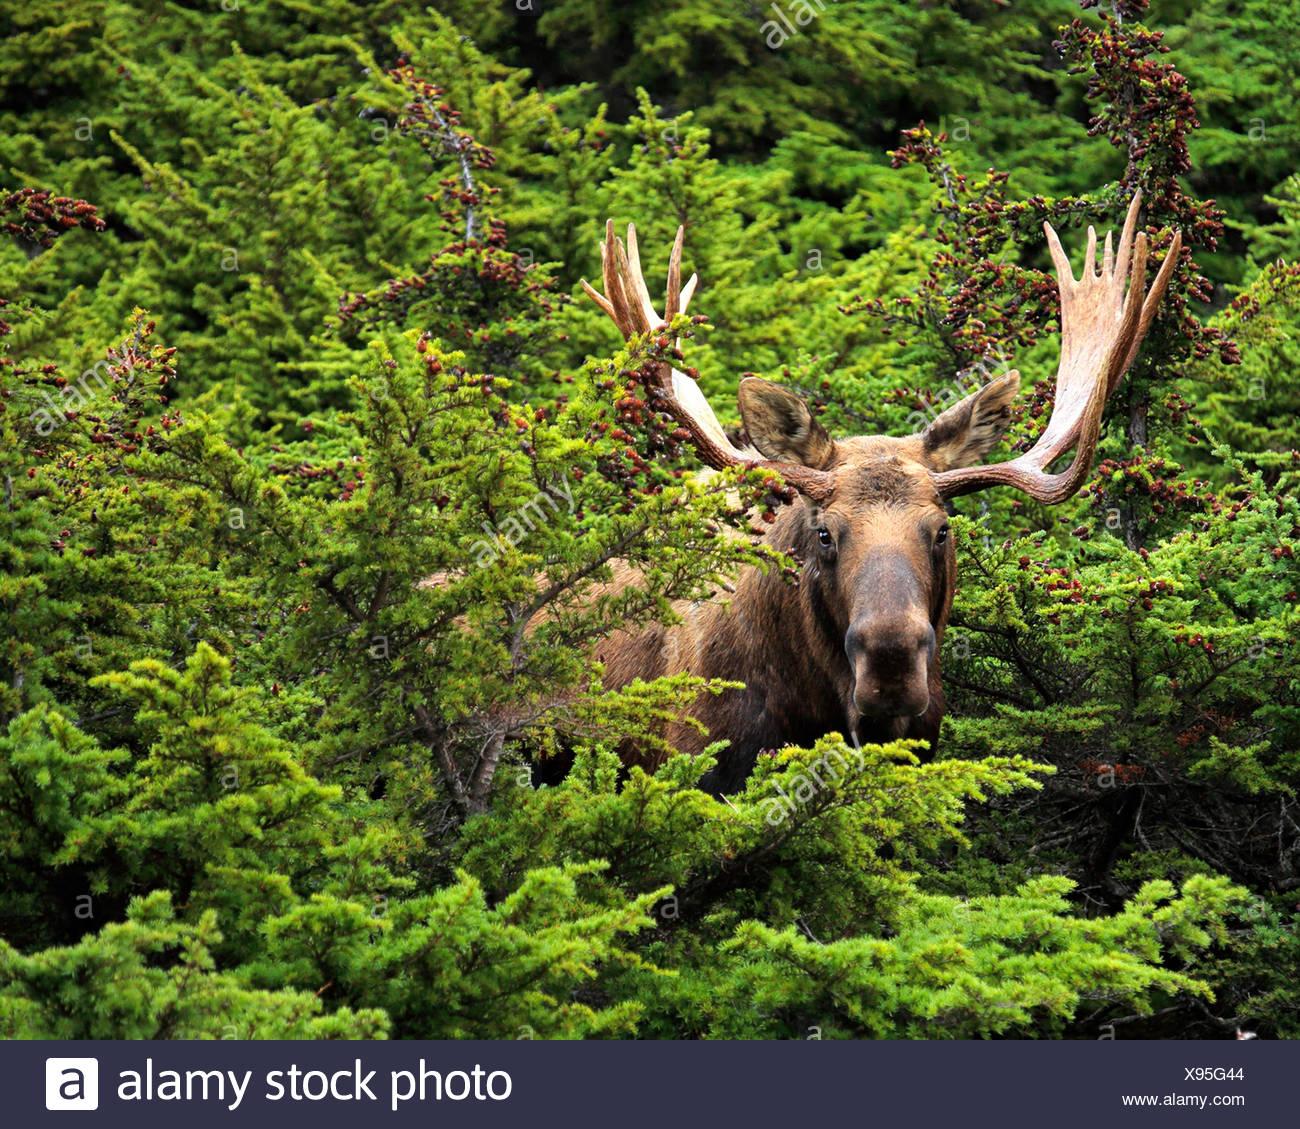 Alaska moose, Tundra moose, Yukon moose (Alces alces gigas), bull elk, USA, Alaska, Chugach State Park - Stock Image